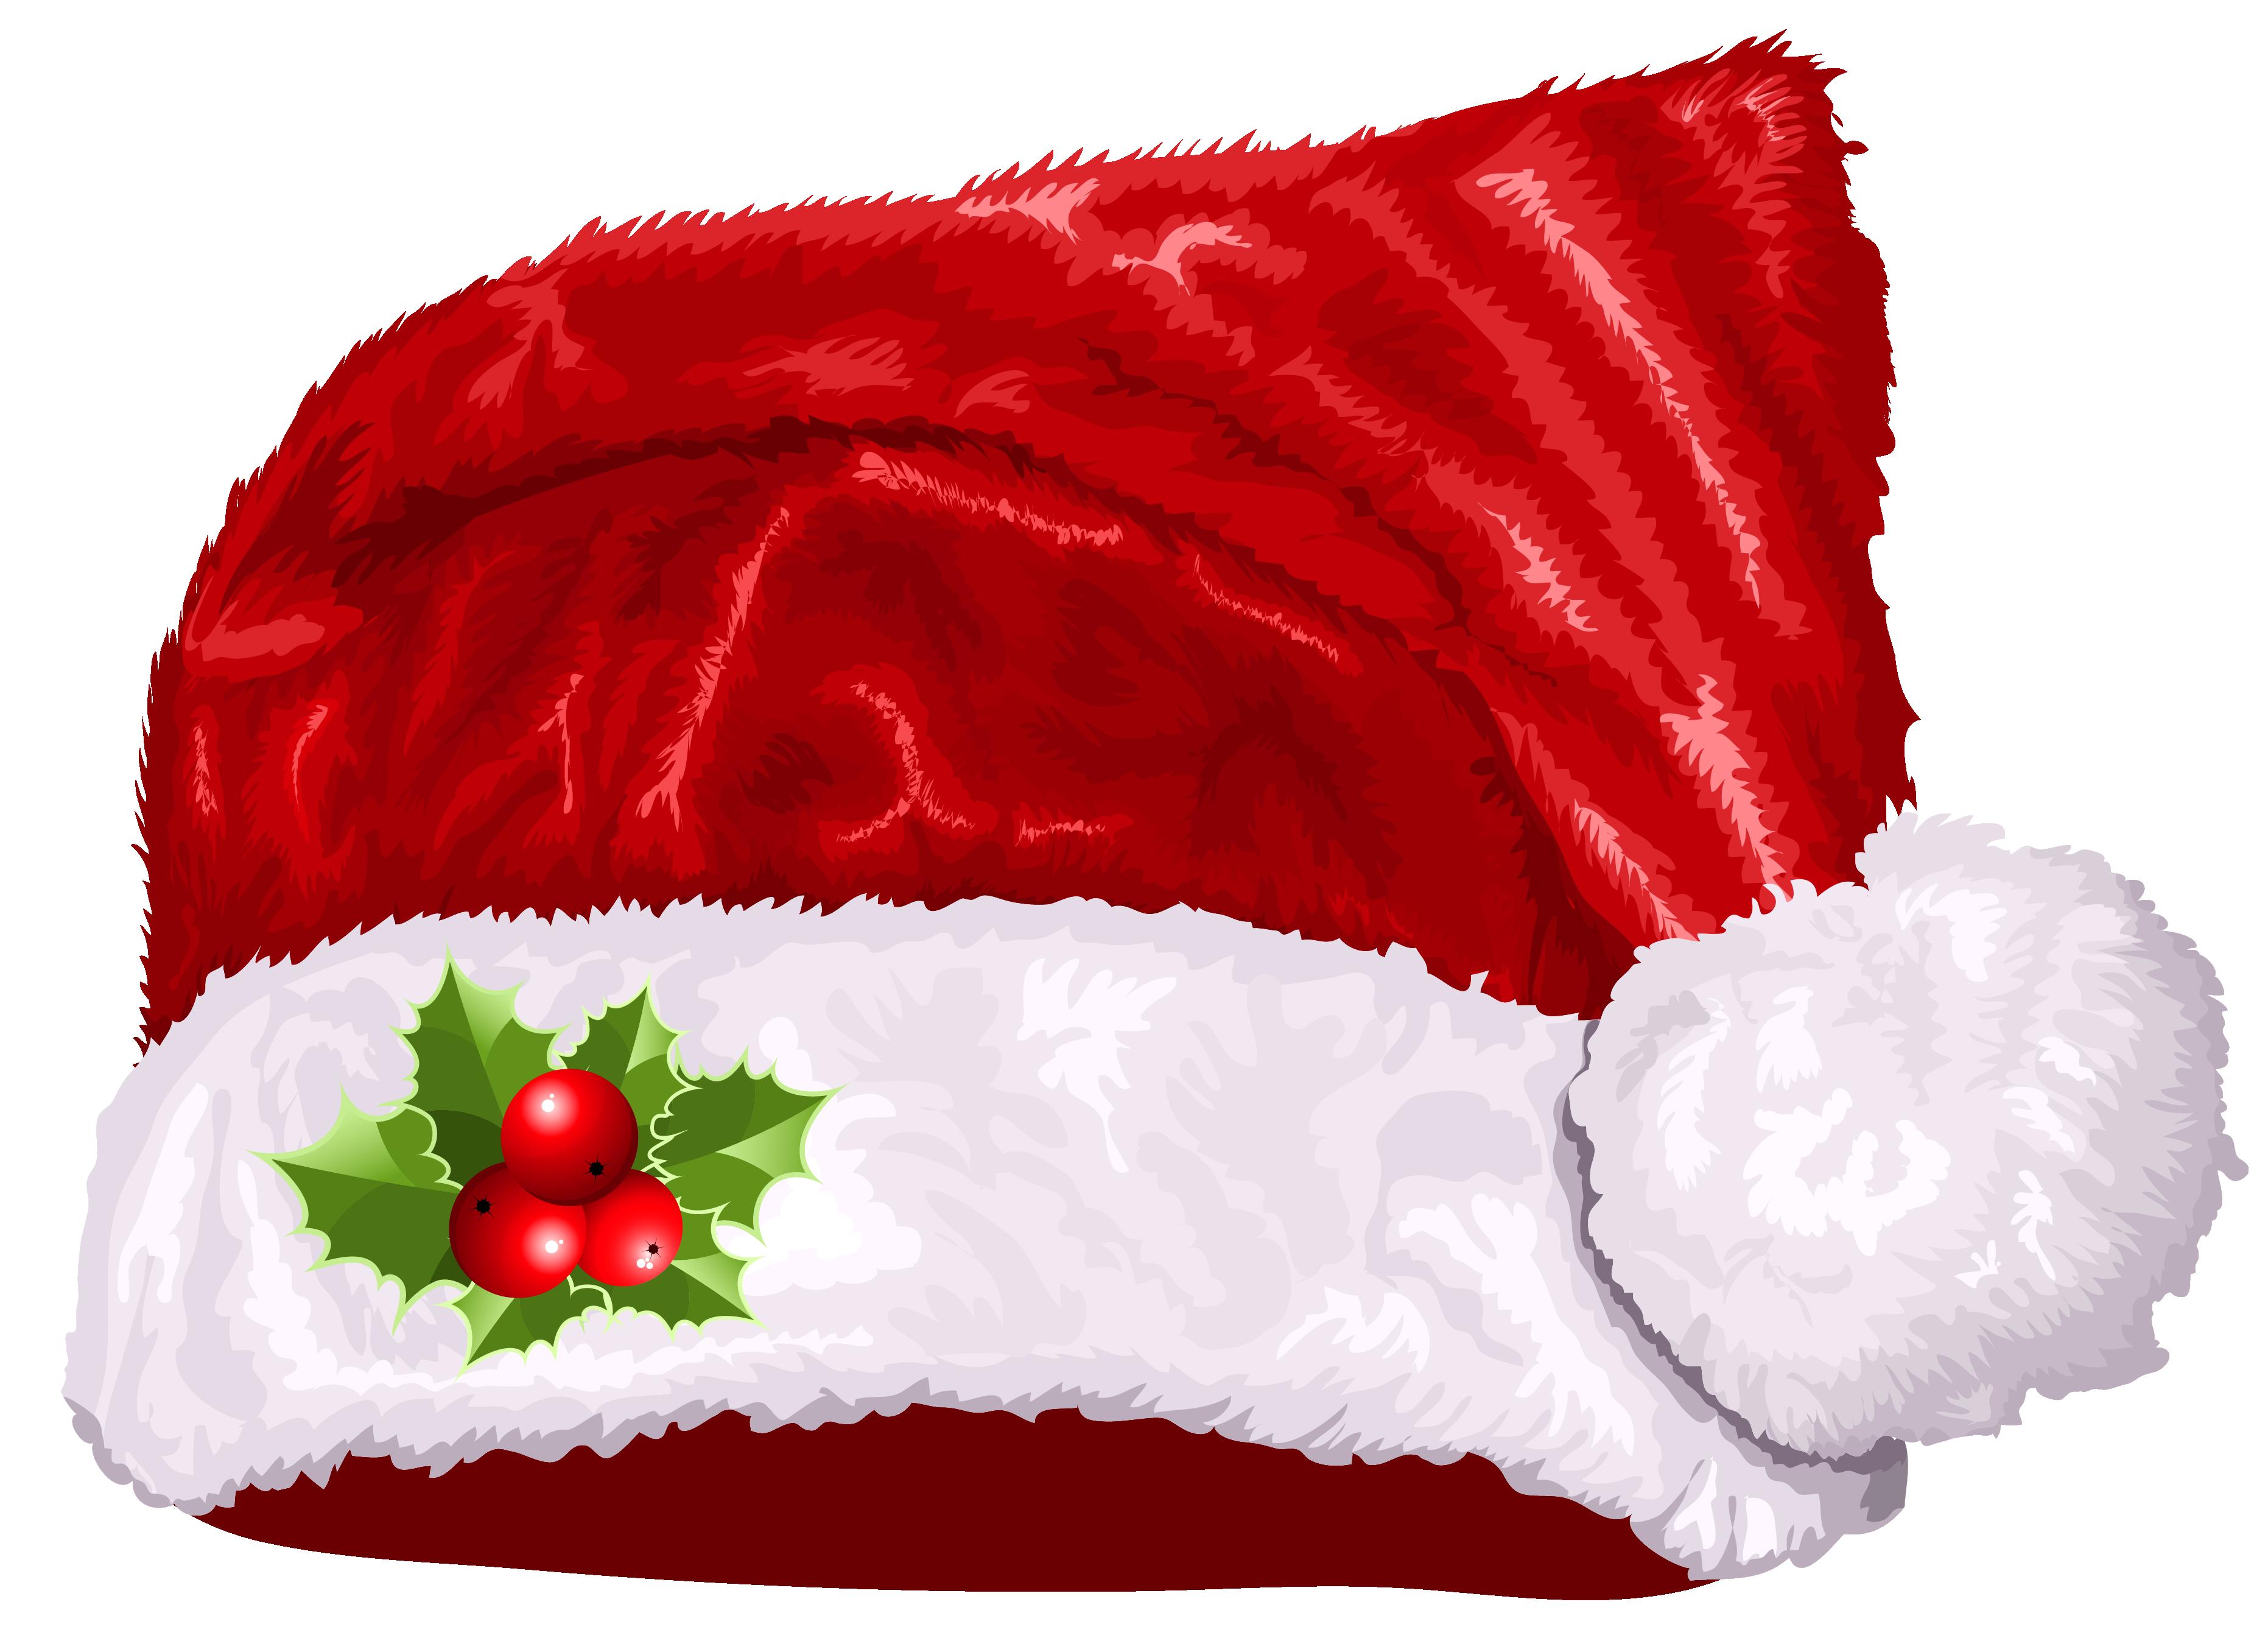 Clipart football christmas. Large transparent santa hat